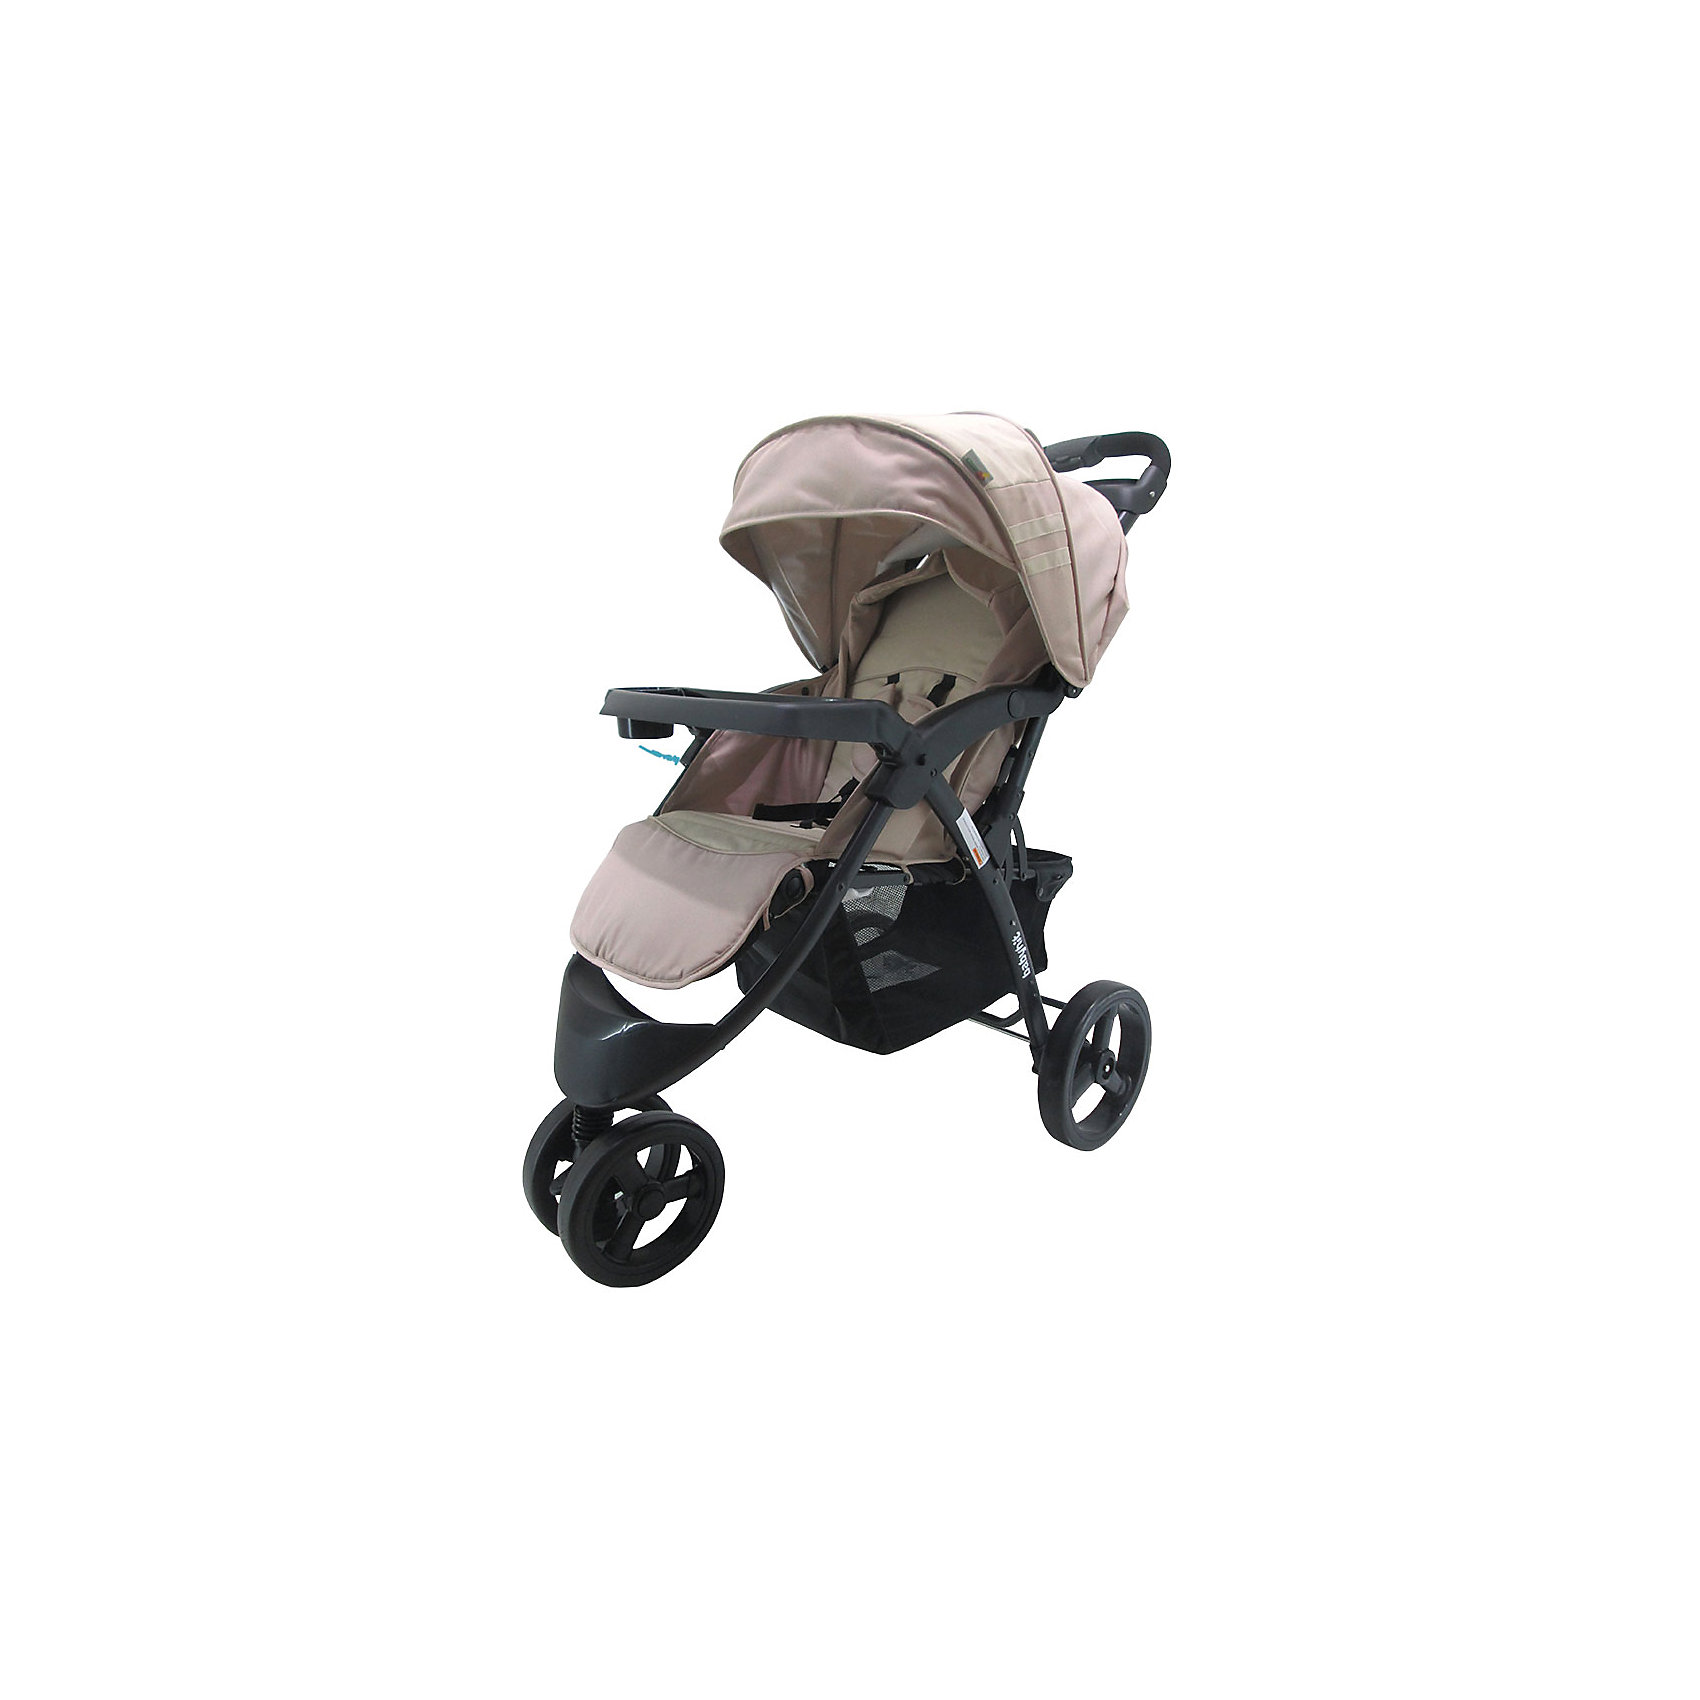 Baby Hit Прогулочная коляска Voyage, Baby Hit, бежевый прогулочная коляска cool baby kdd 6795dc 1 green